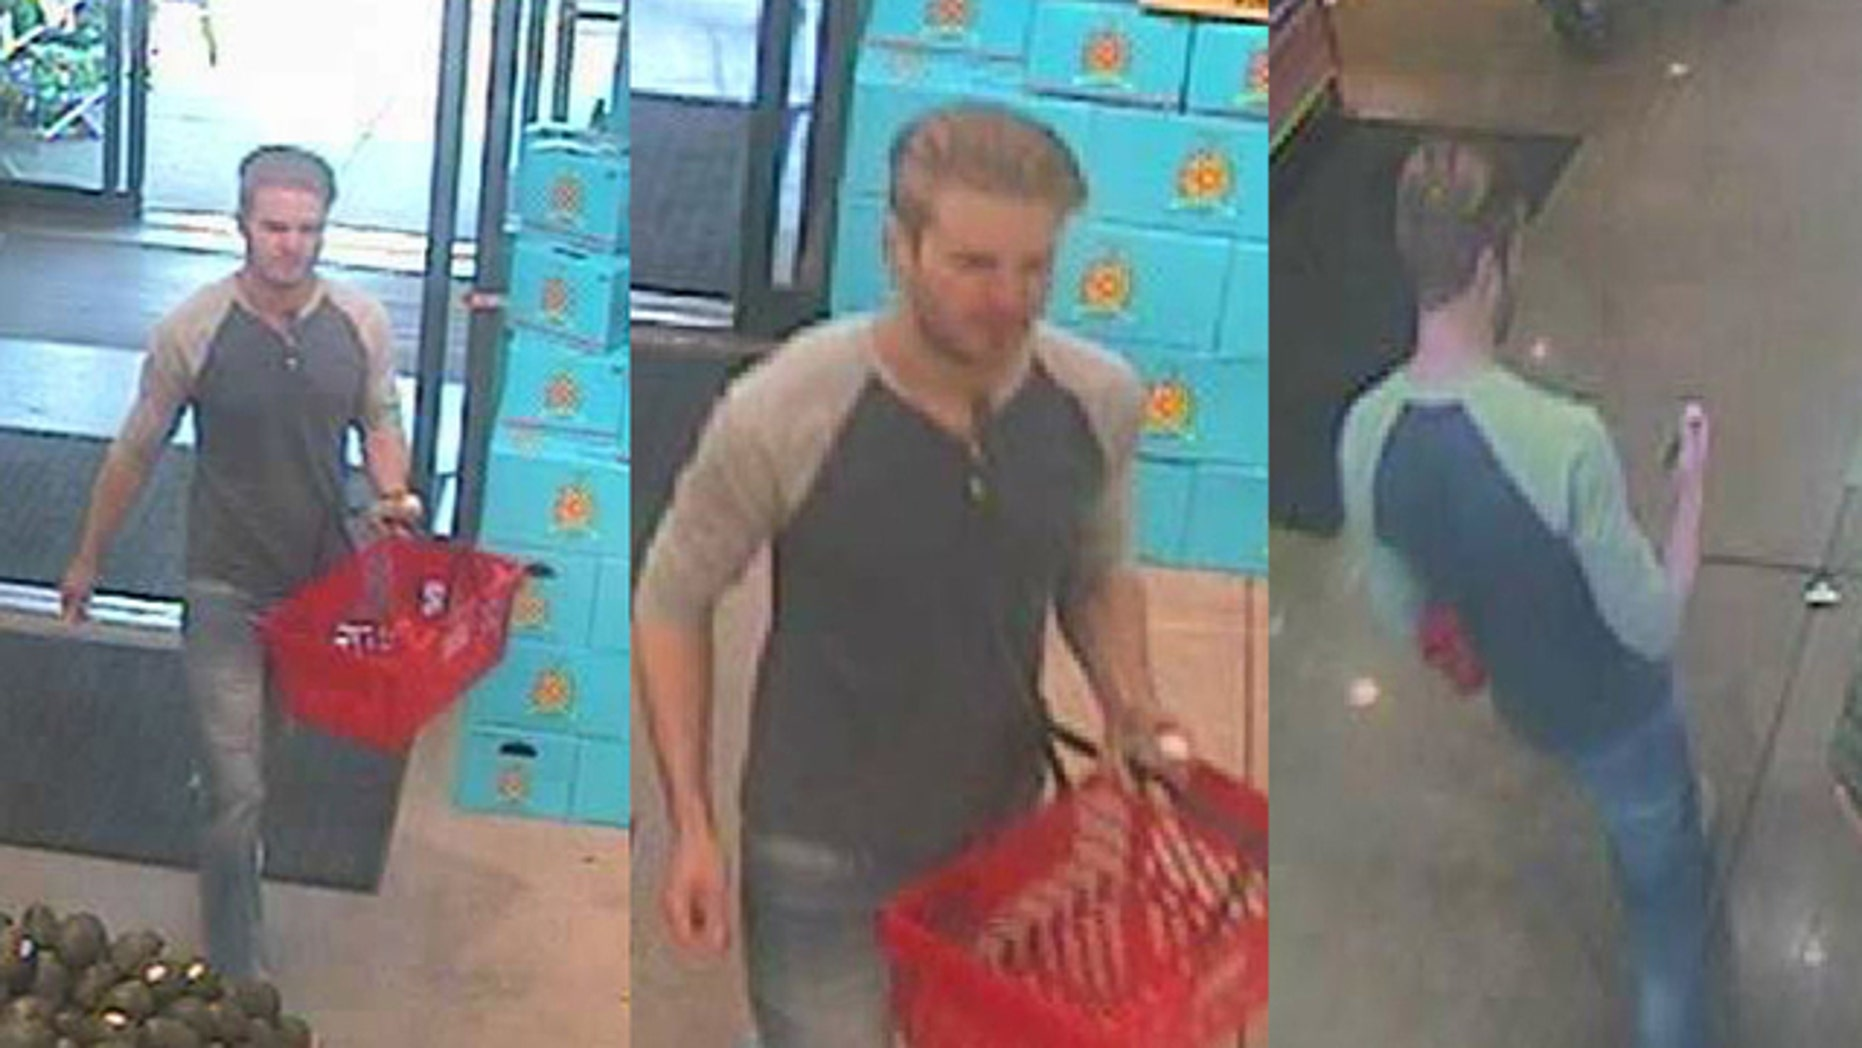 Surveillance images of the suspect.